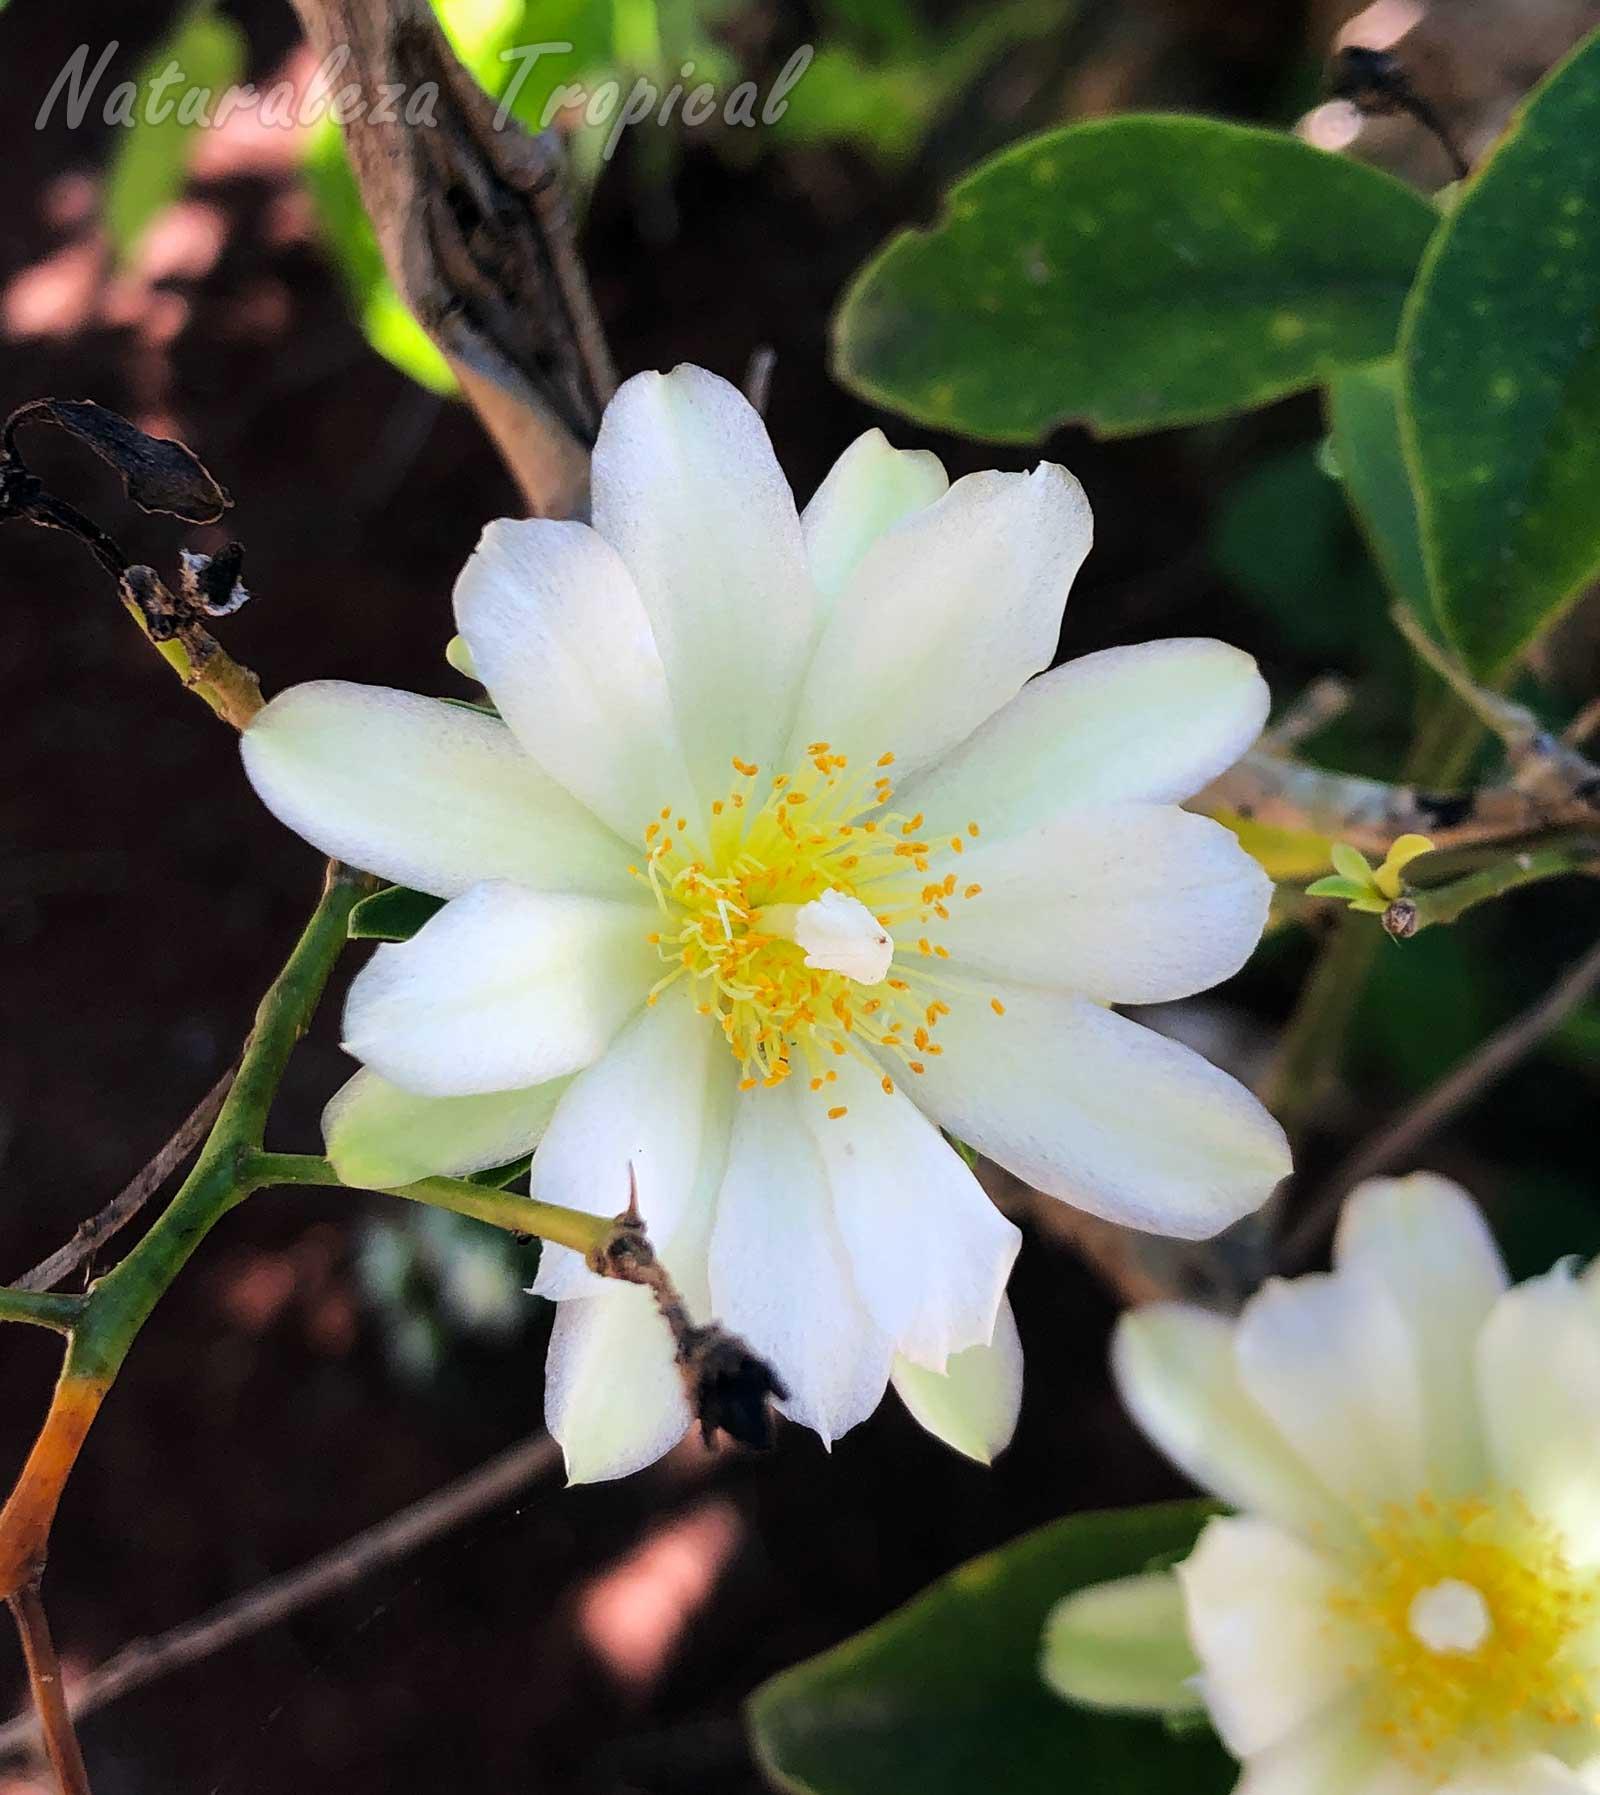 Detalles de la flor del cactus Corona de Novia, Pereskia aculeata